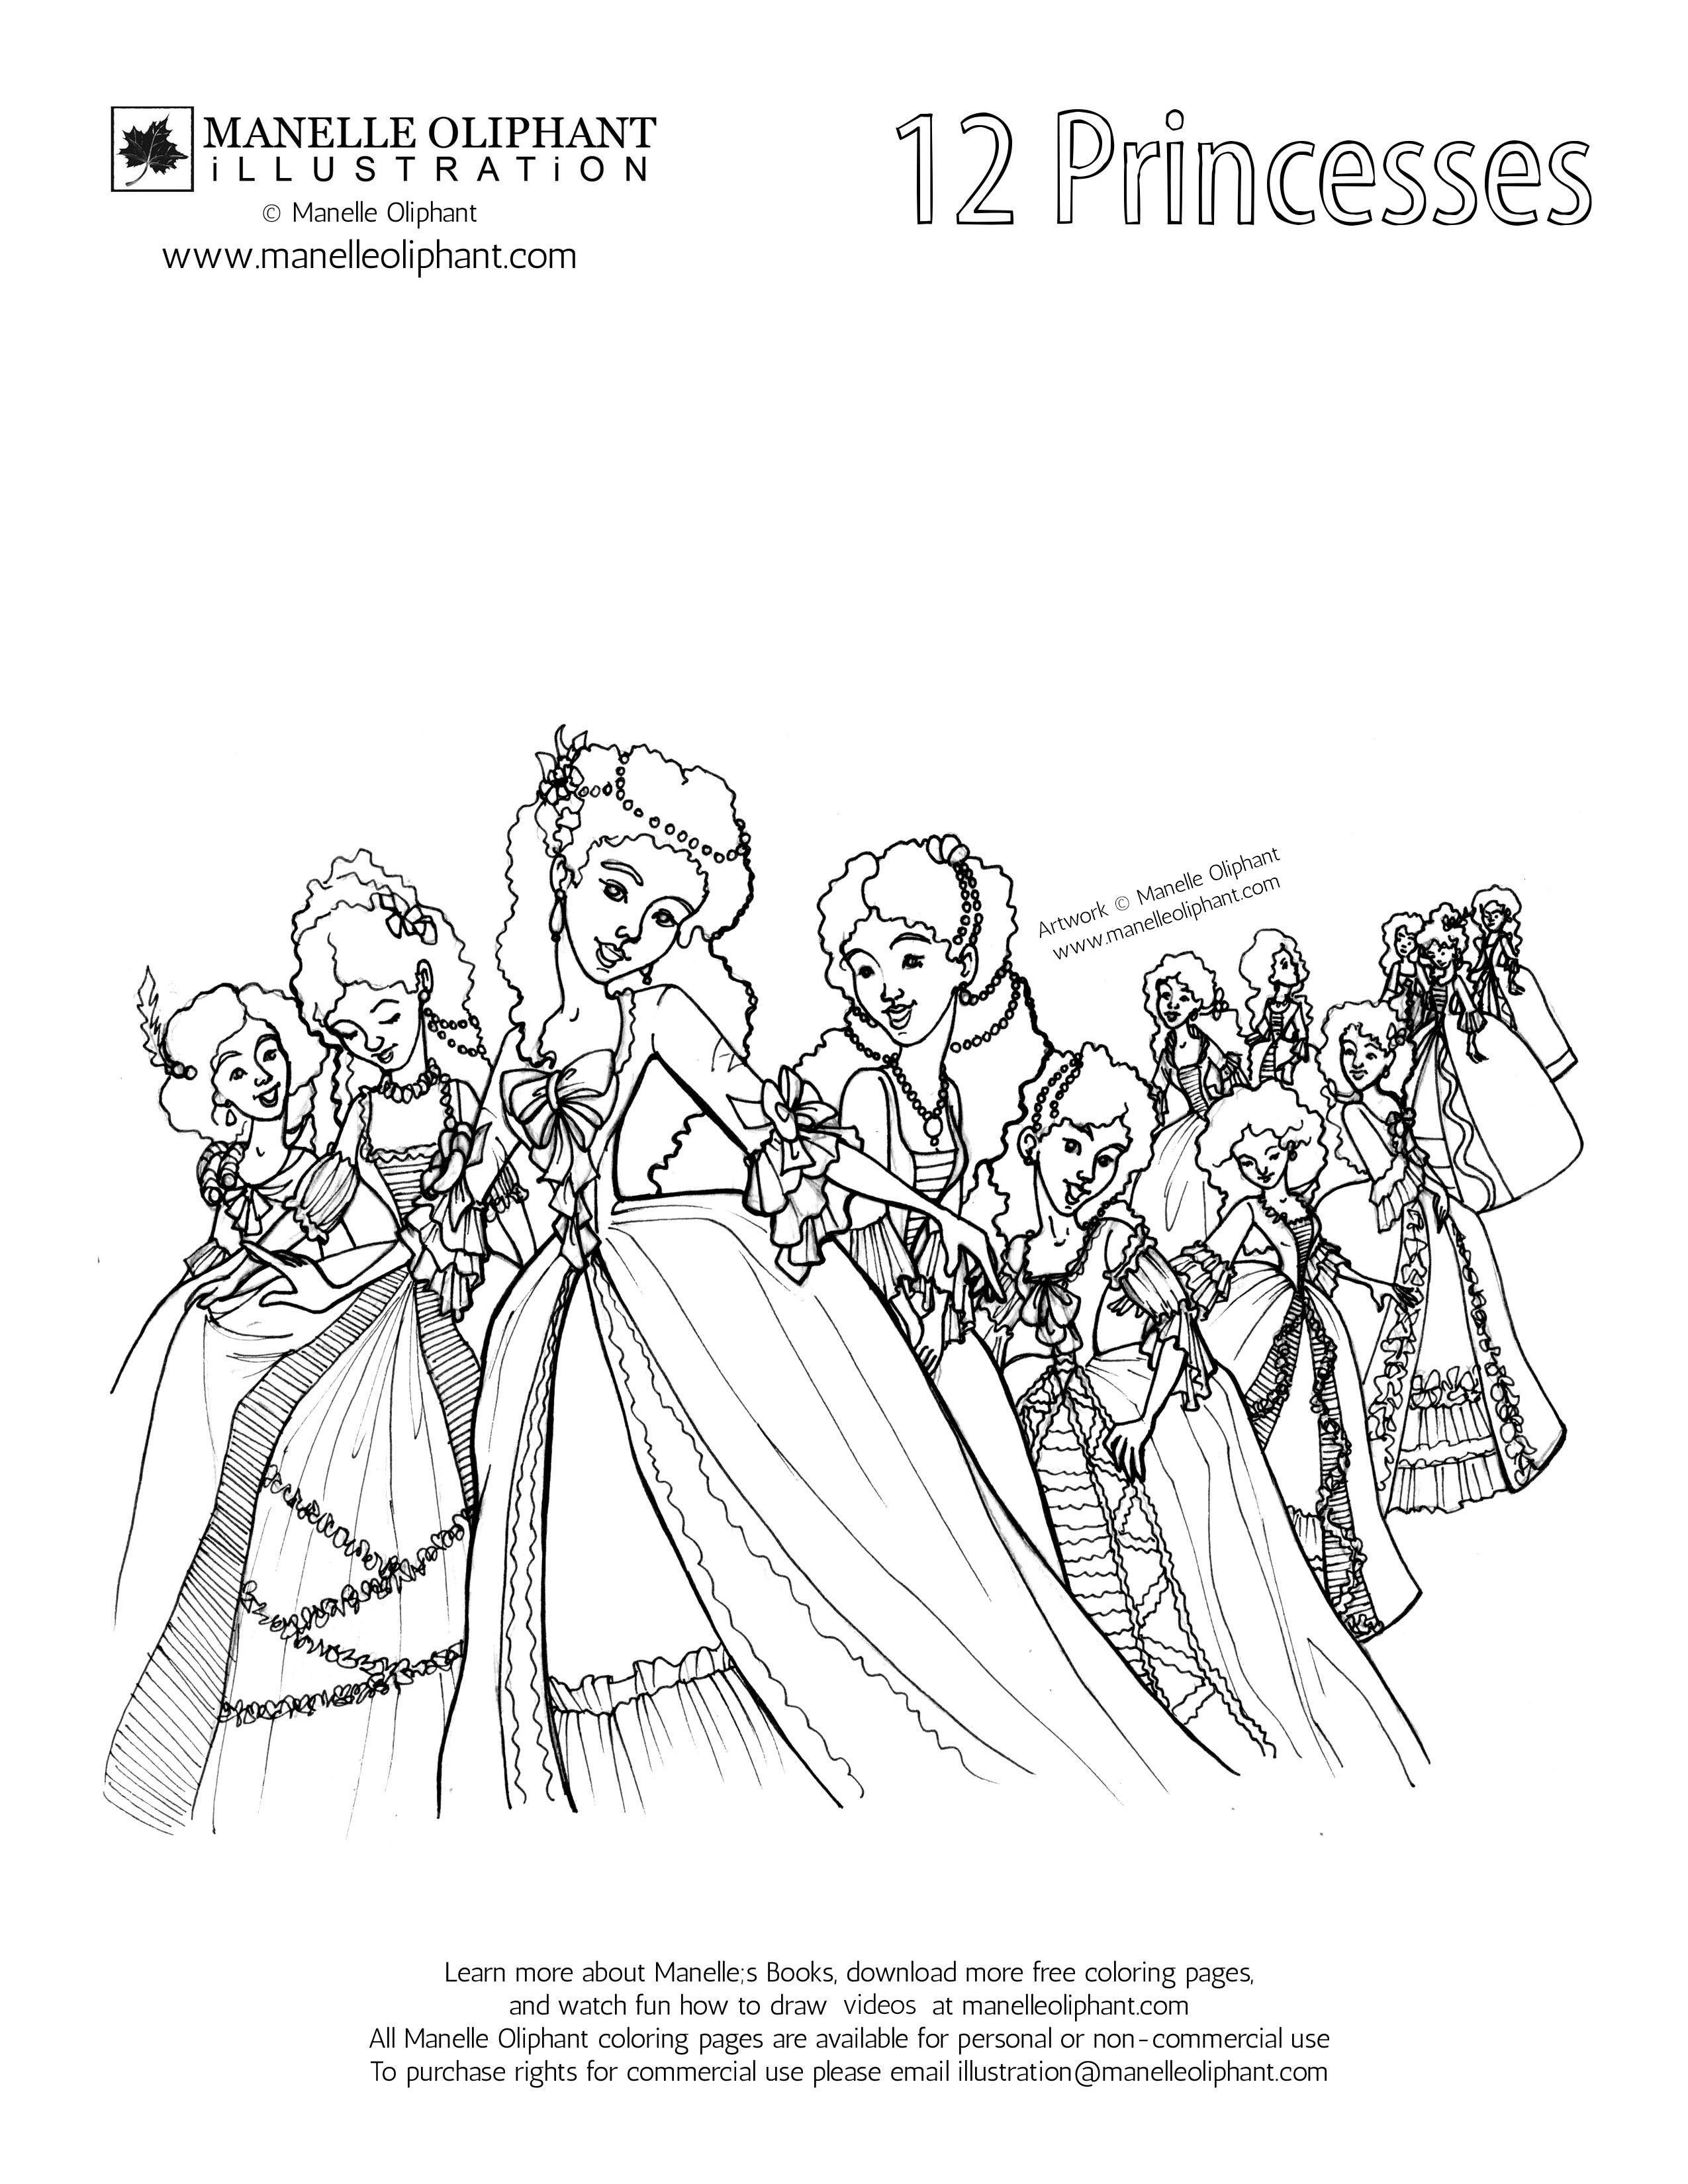 12 Dancing Princesses Princess Coloring Pages 12 Dancing Princesses Princess Coloring